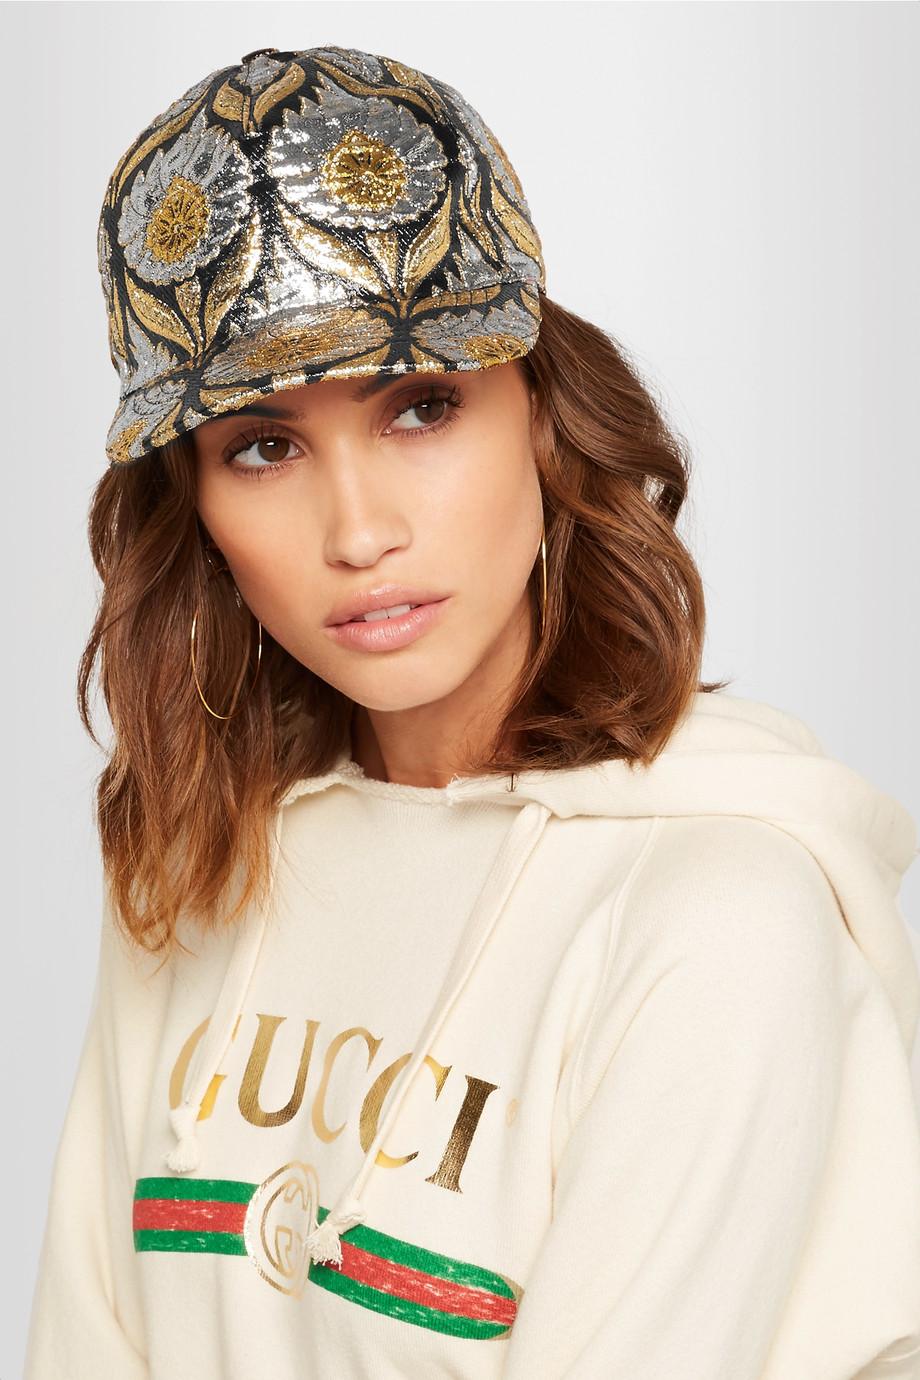 Gucci hat on model